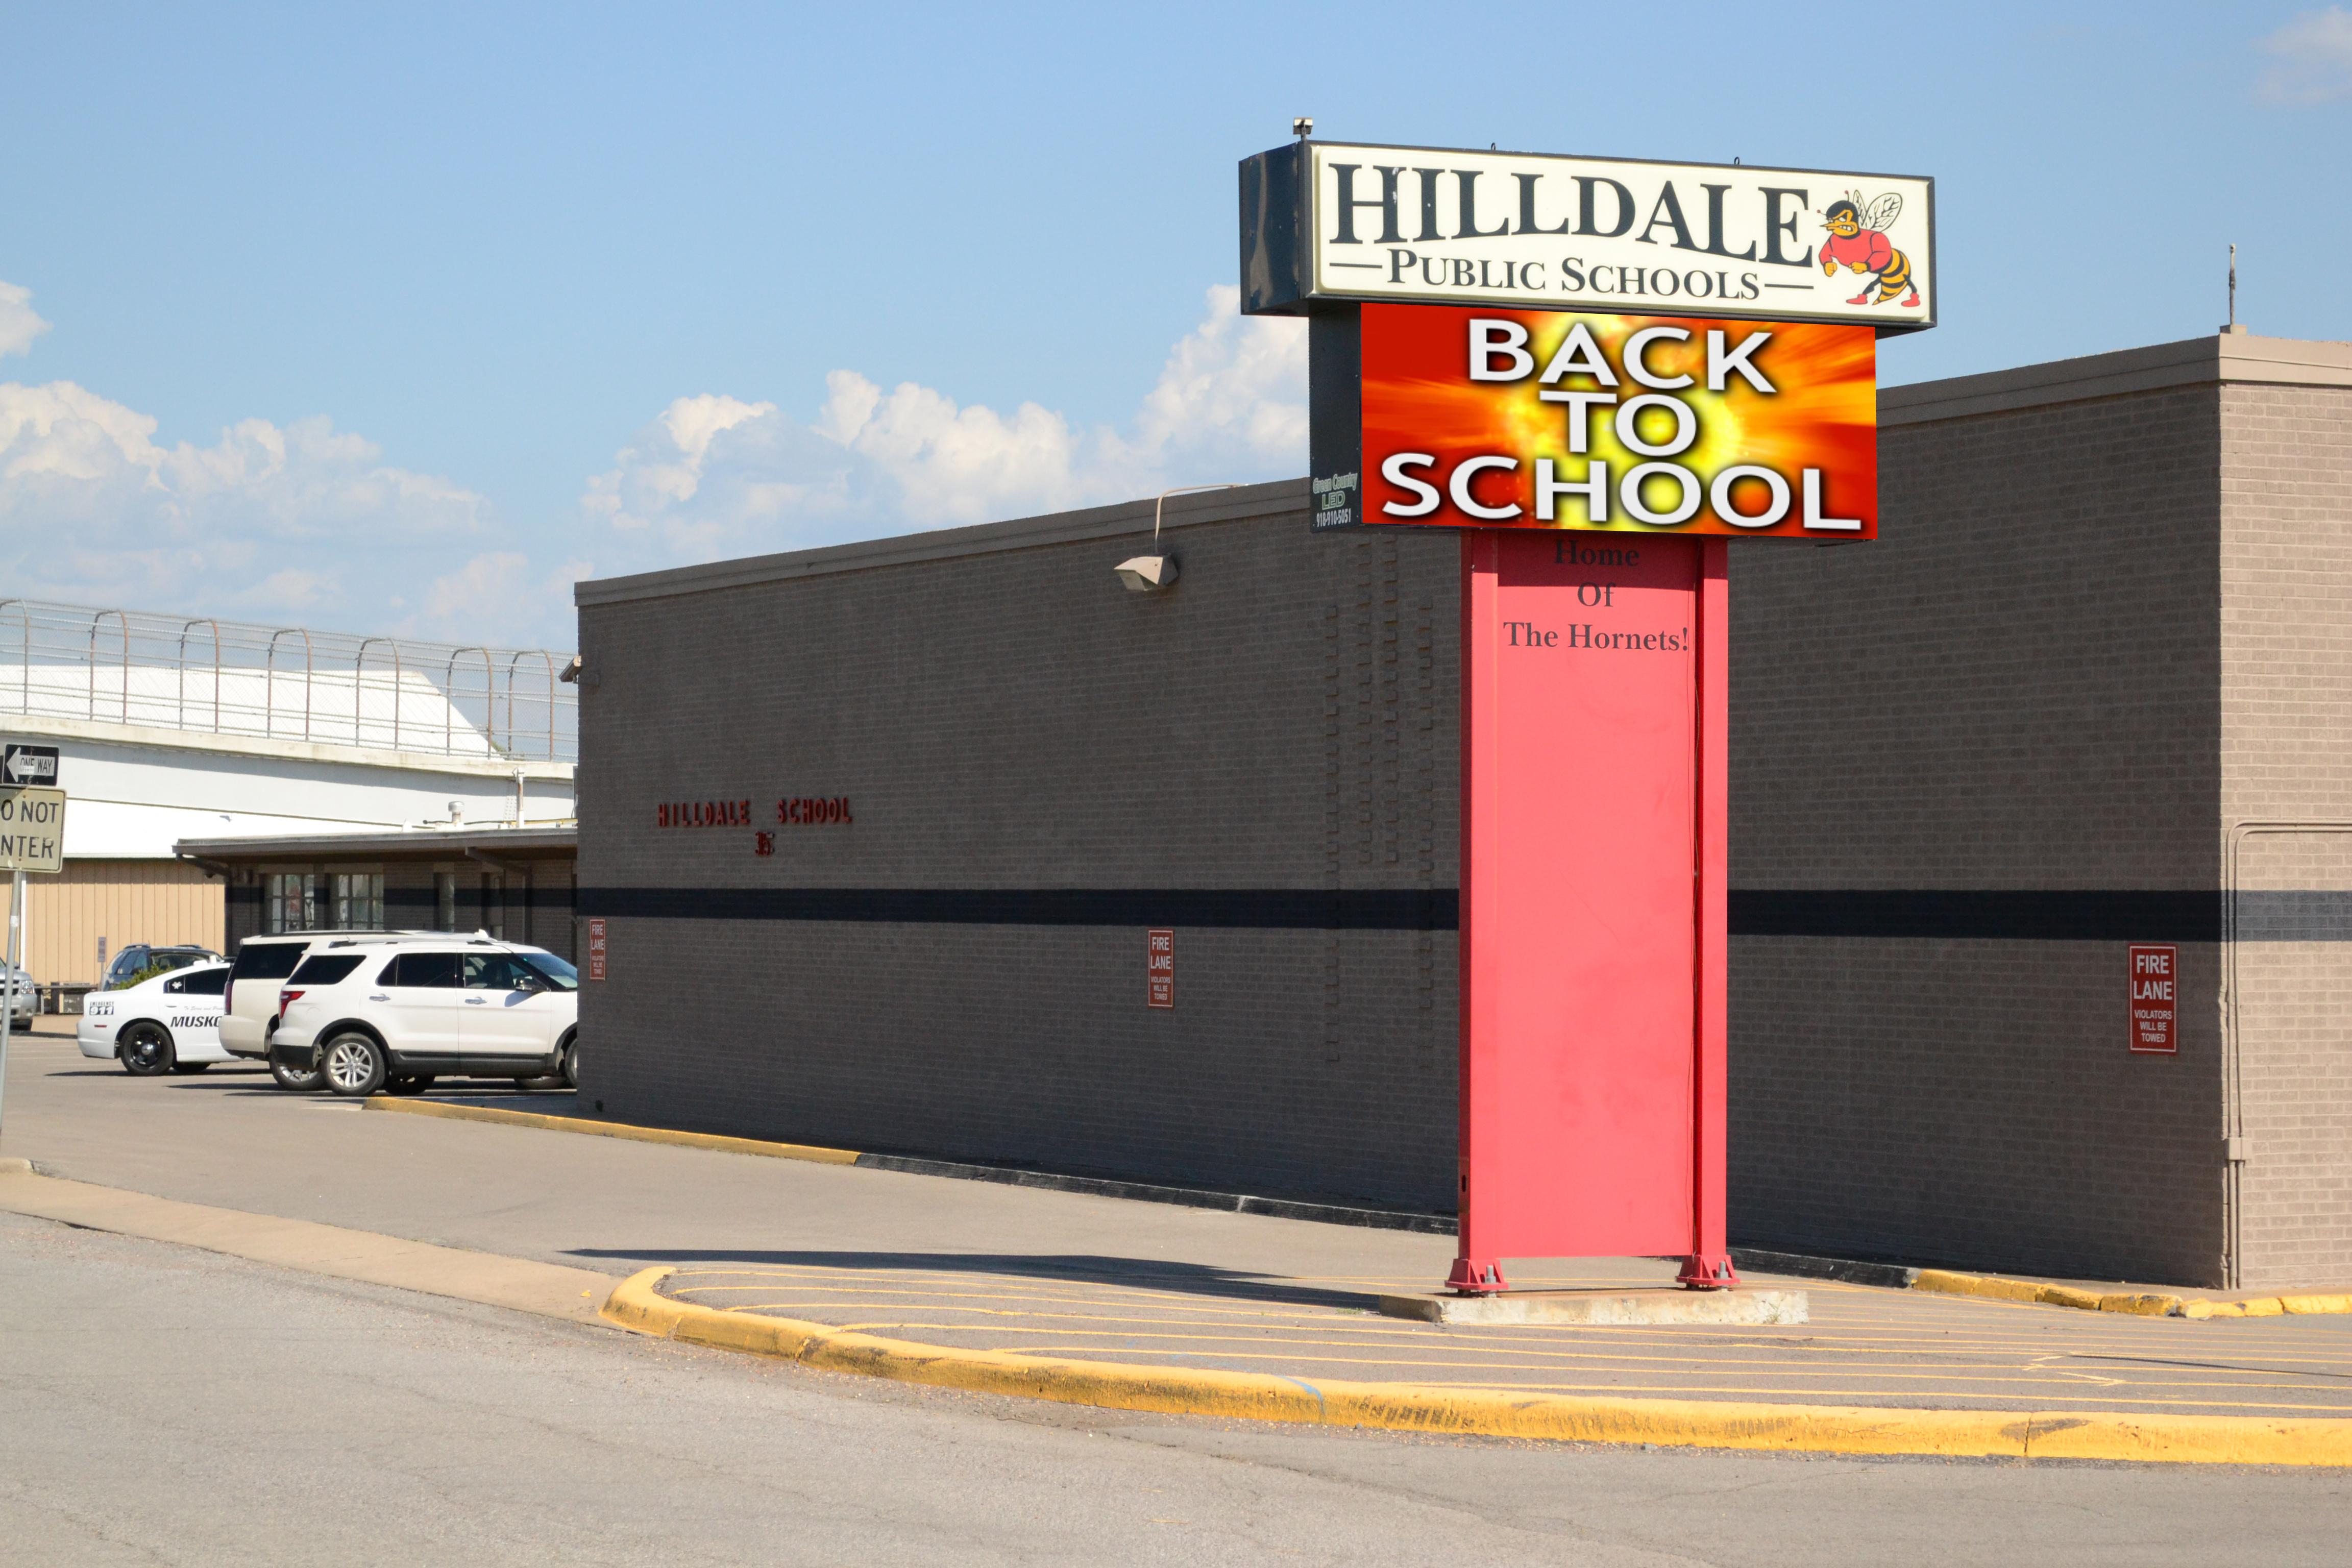 Hilldale Public Schools